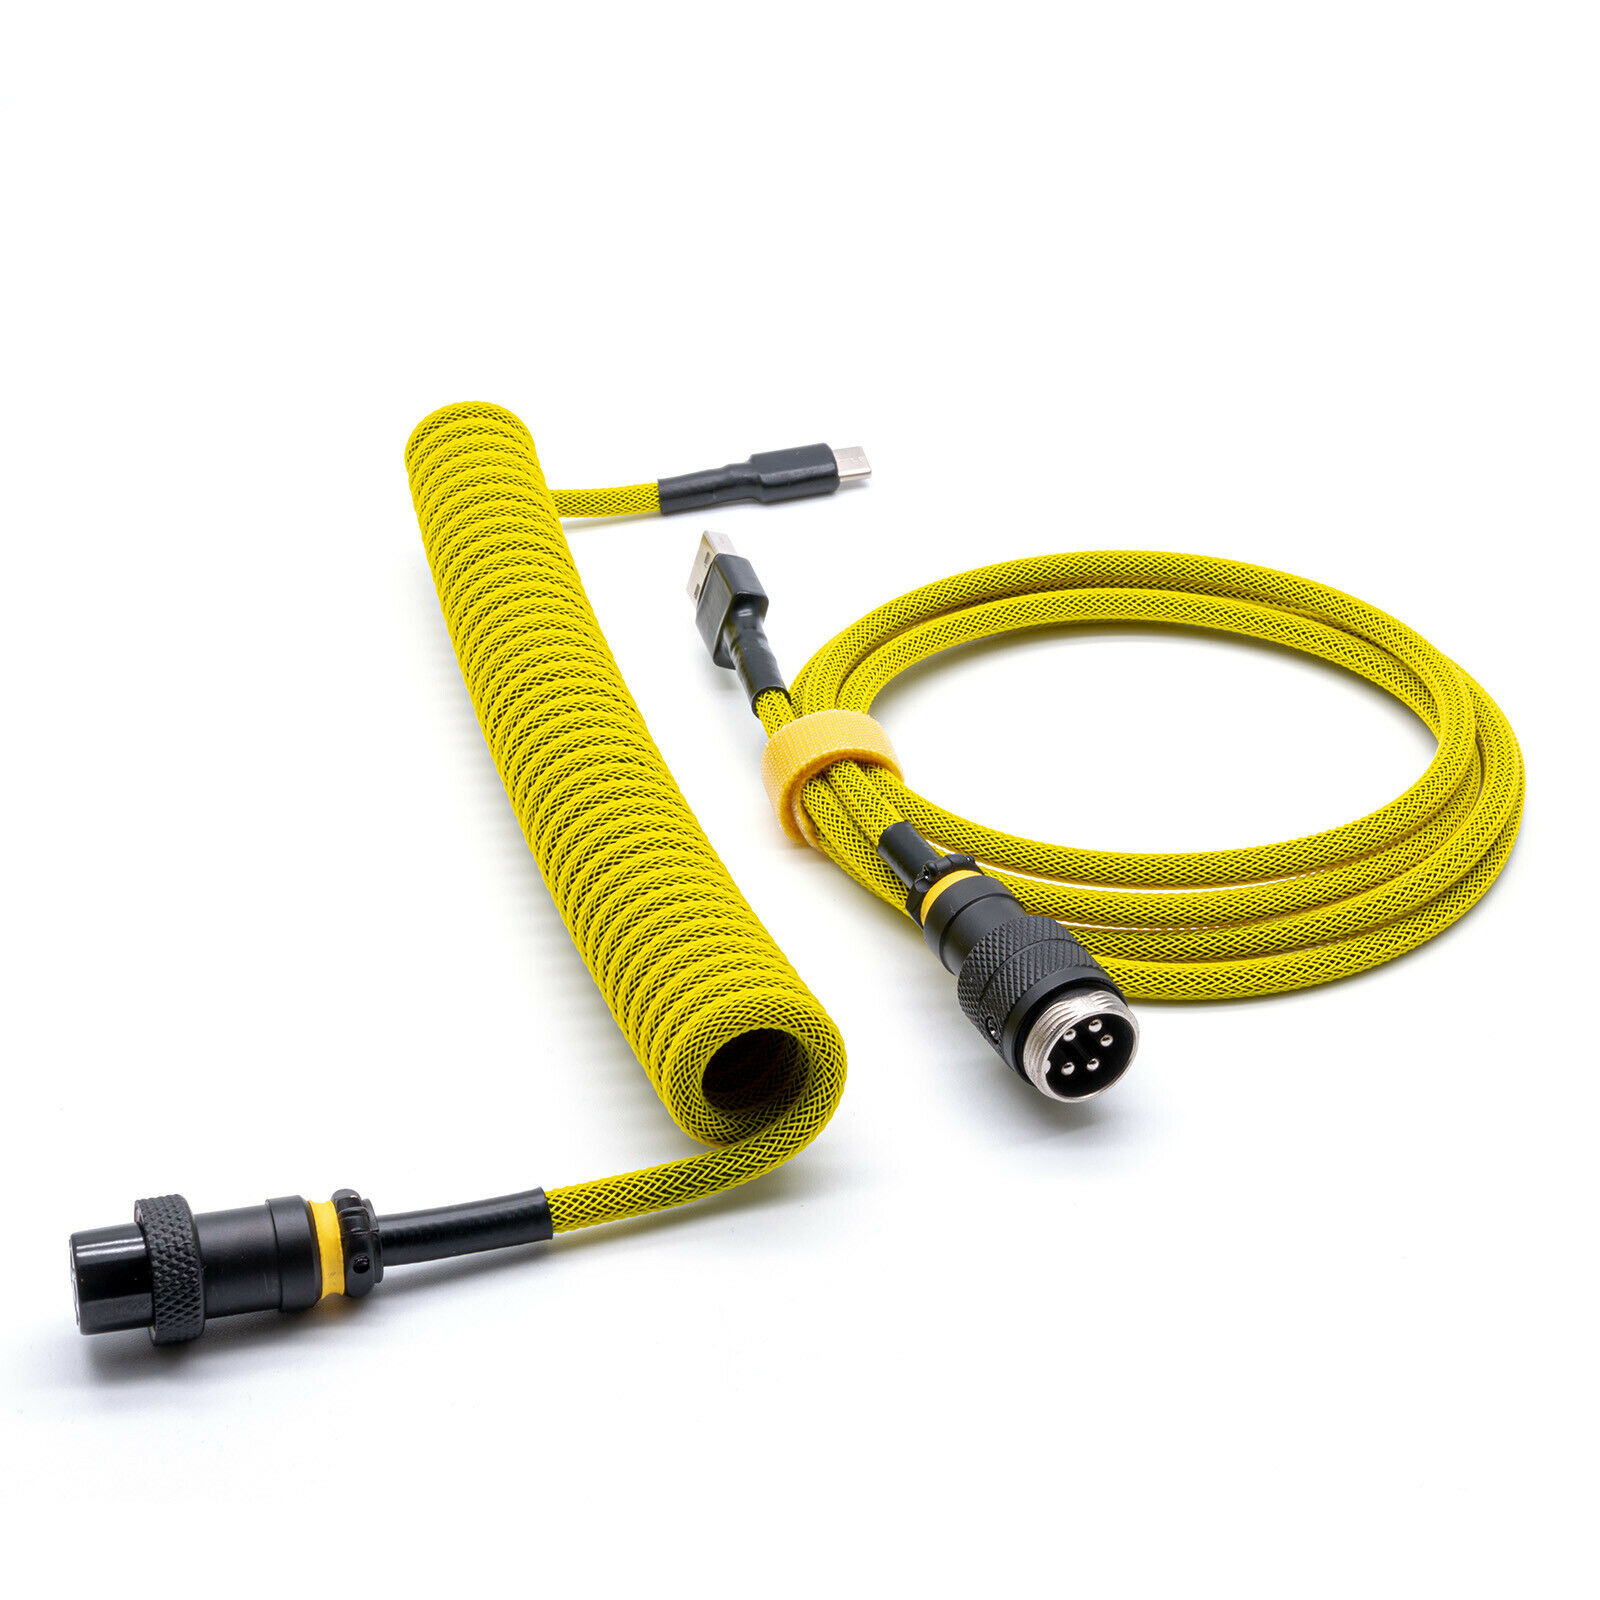 Custom Coiled Type-C Micro USB Cable Yellow For Mechanical Keyboard Aviator GX16